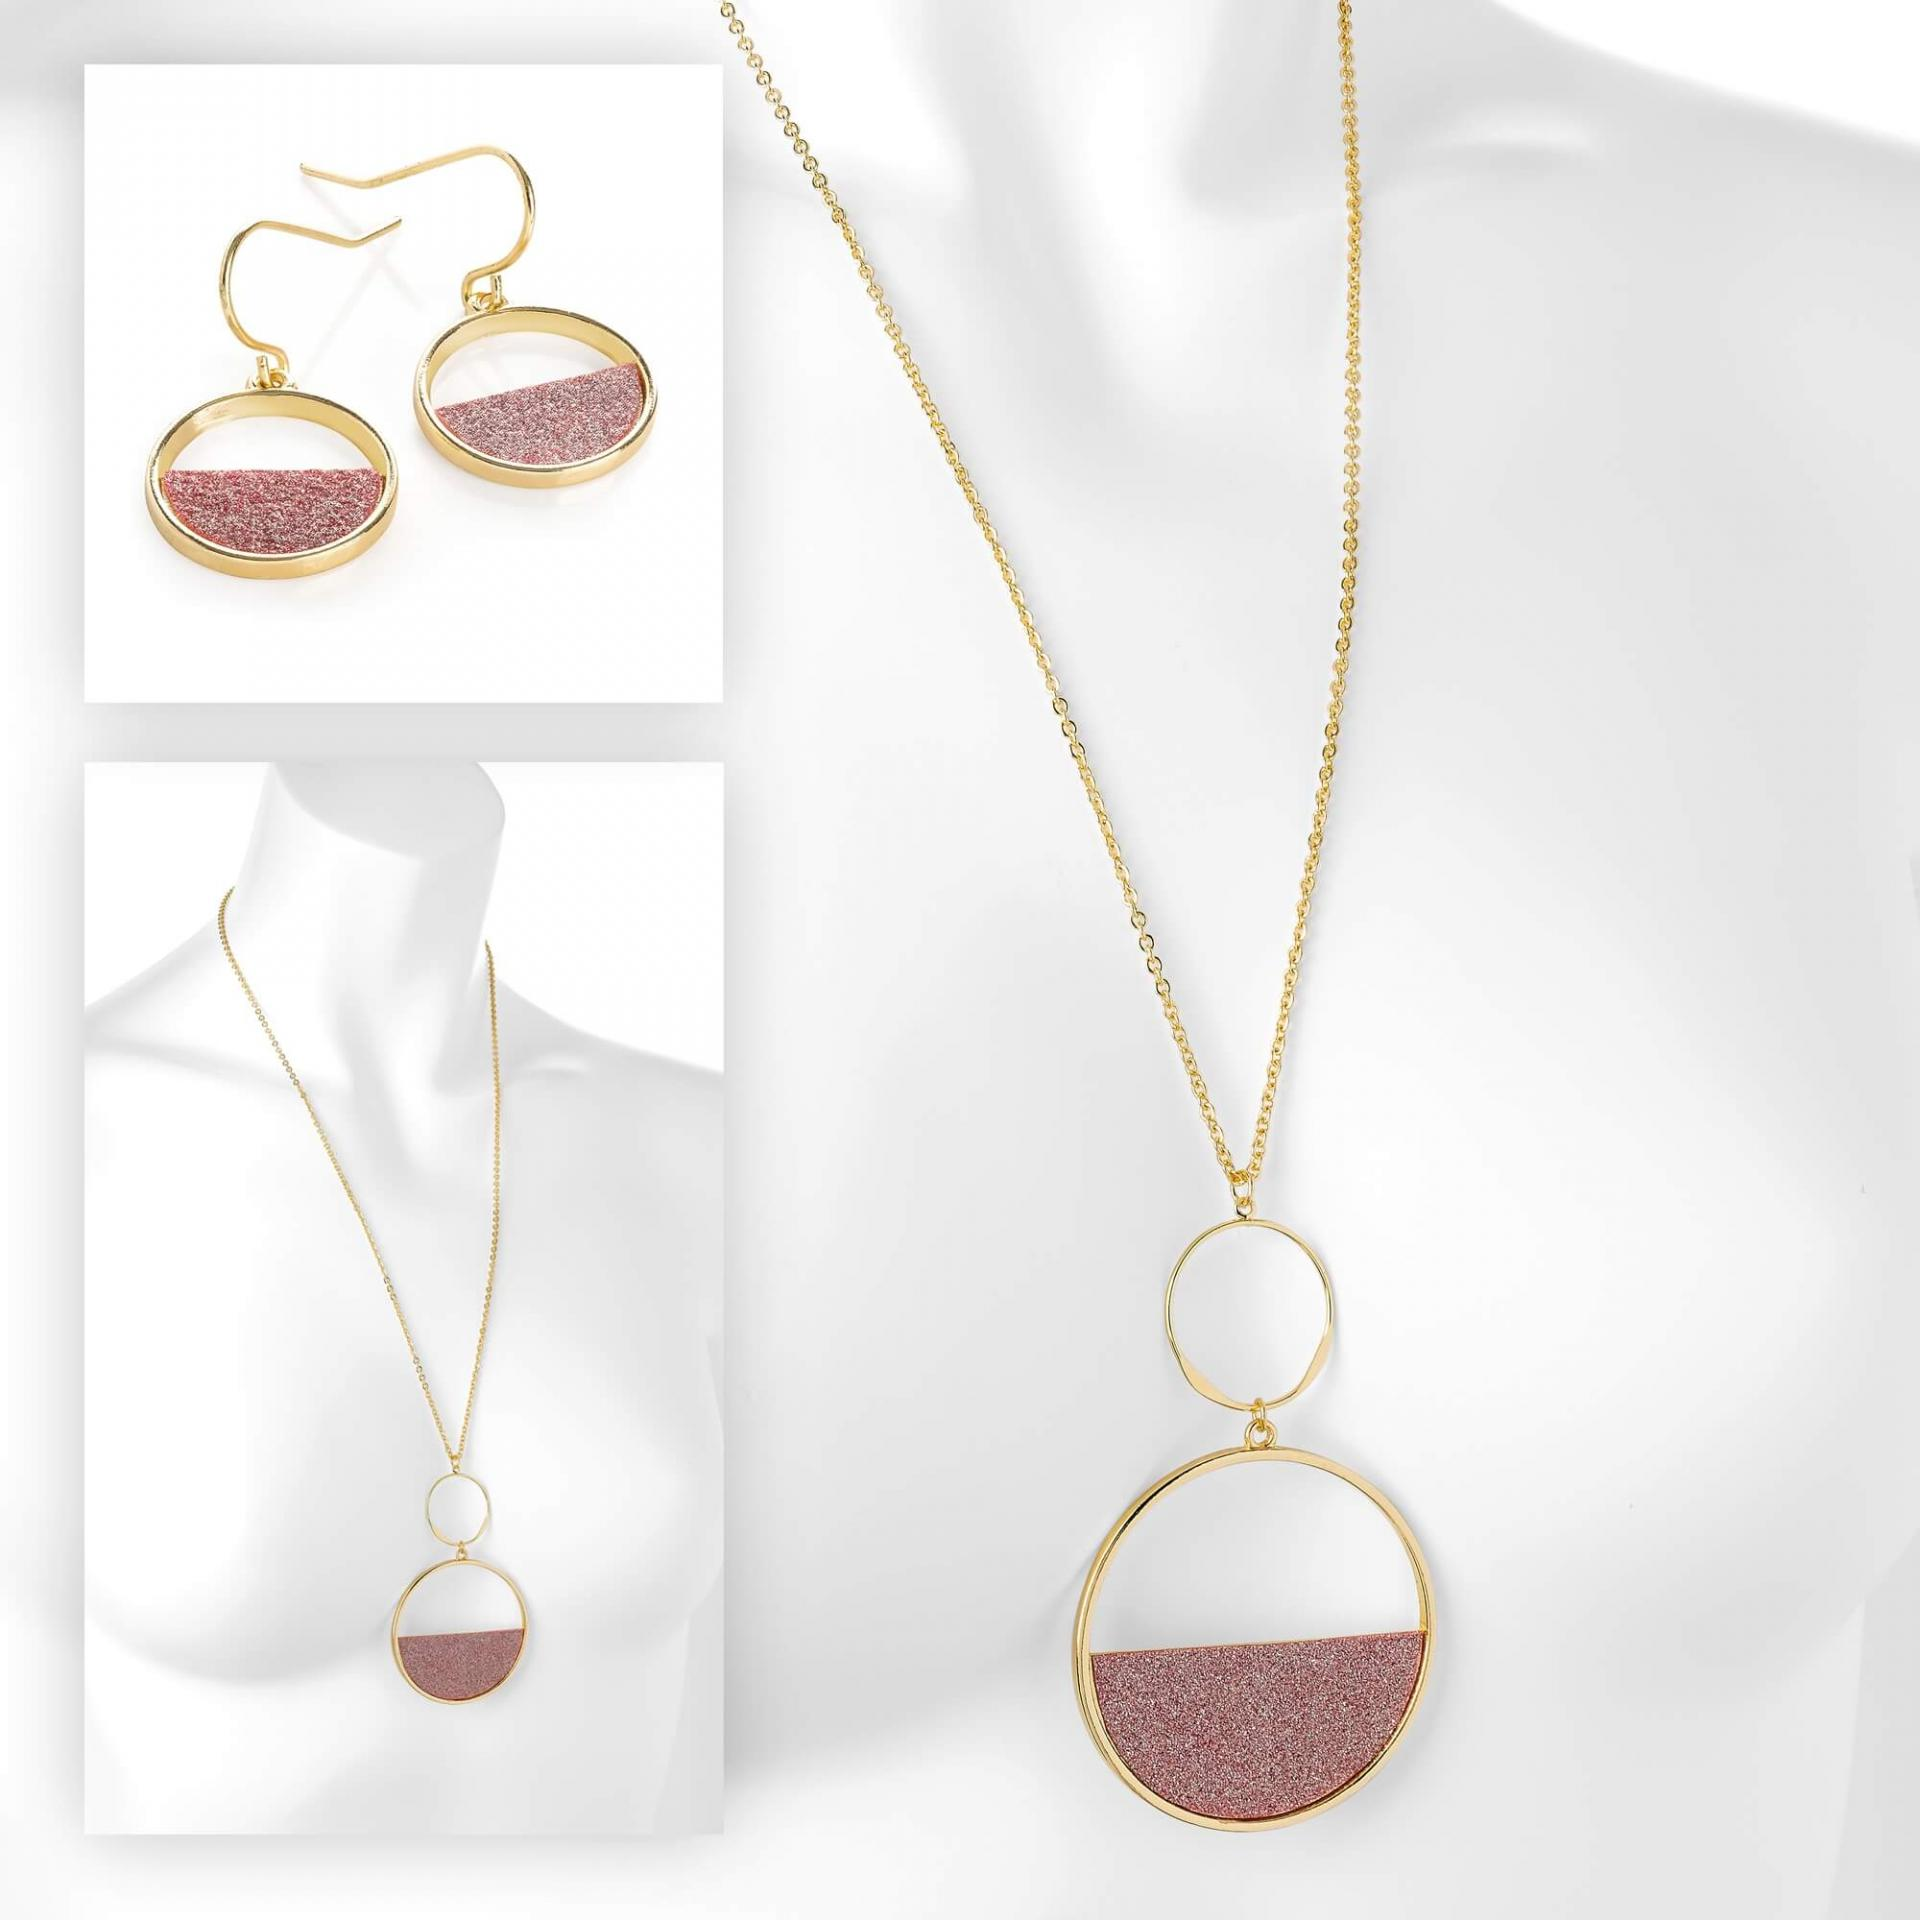 Set de bijoux fantaisie tendance en or rose image 2019